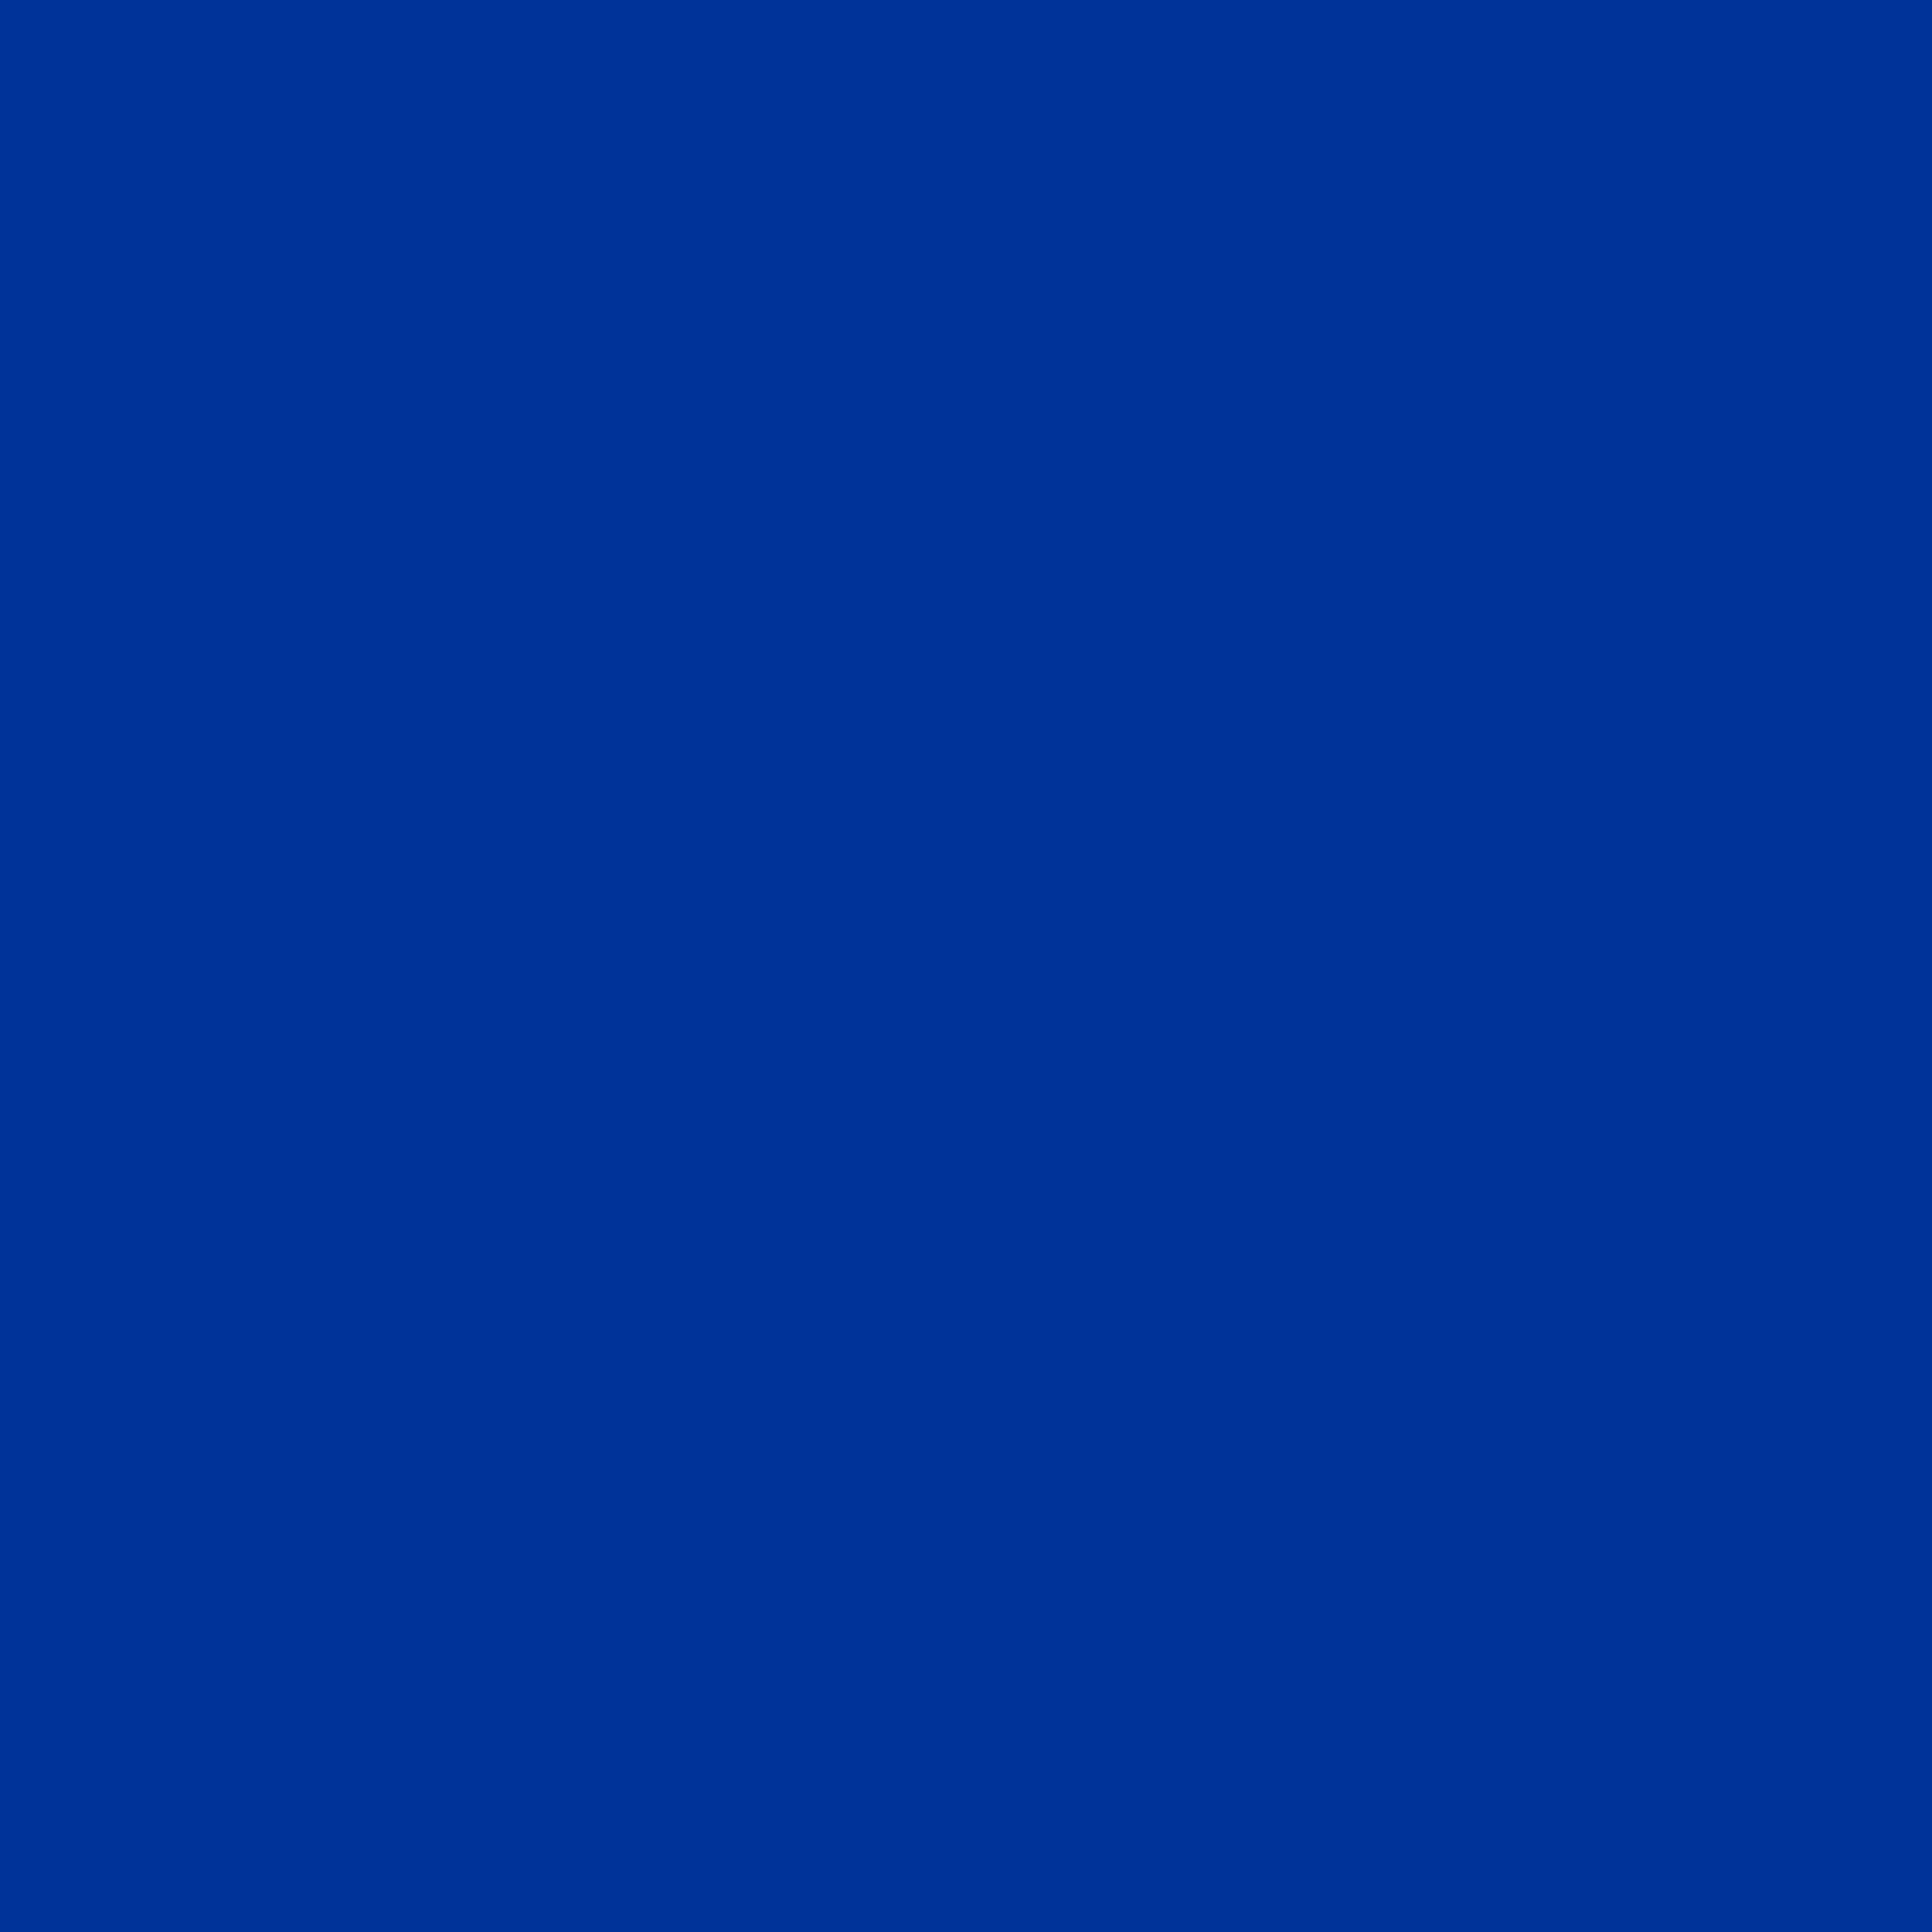 3600x3600 Dark Powder Blue Solid Color Background